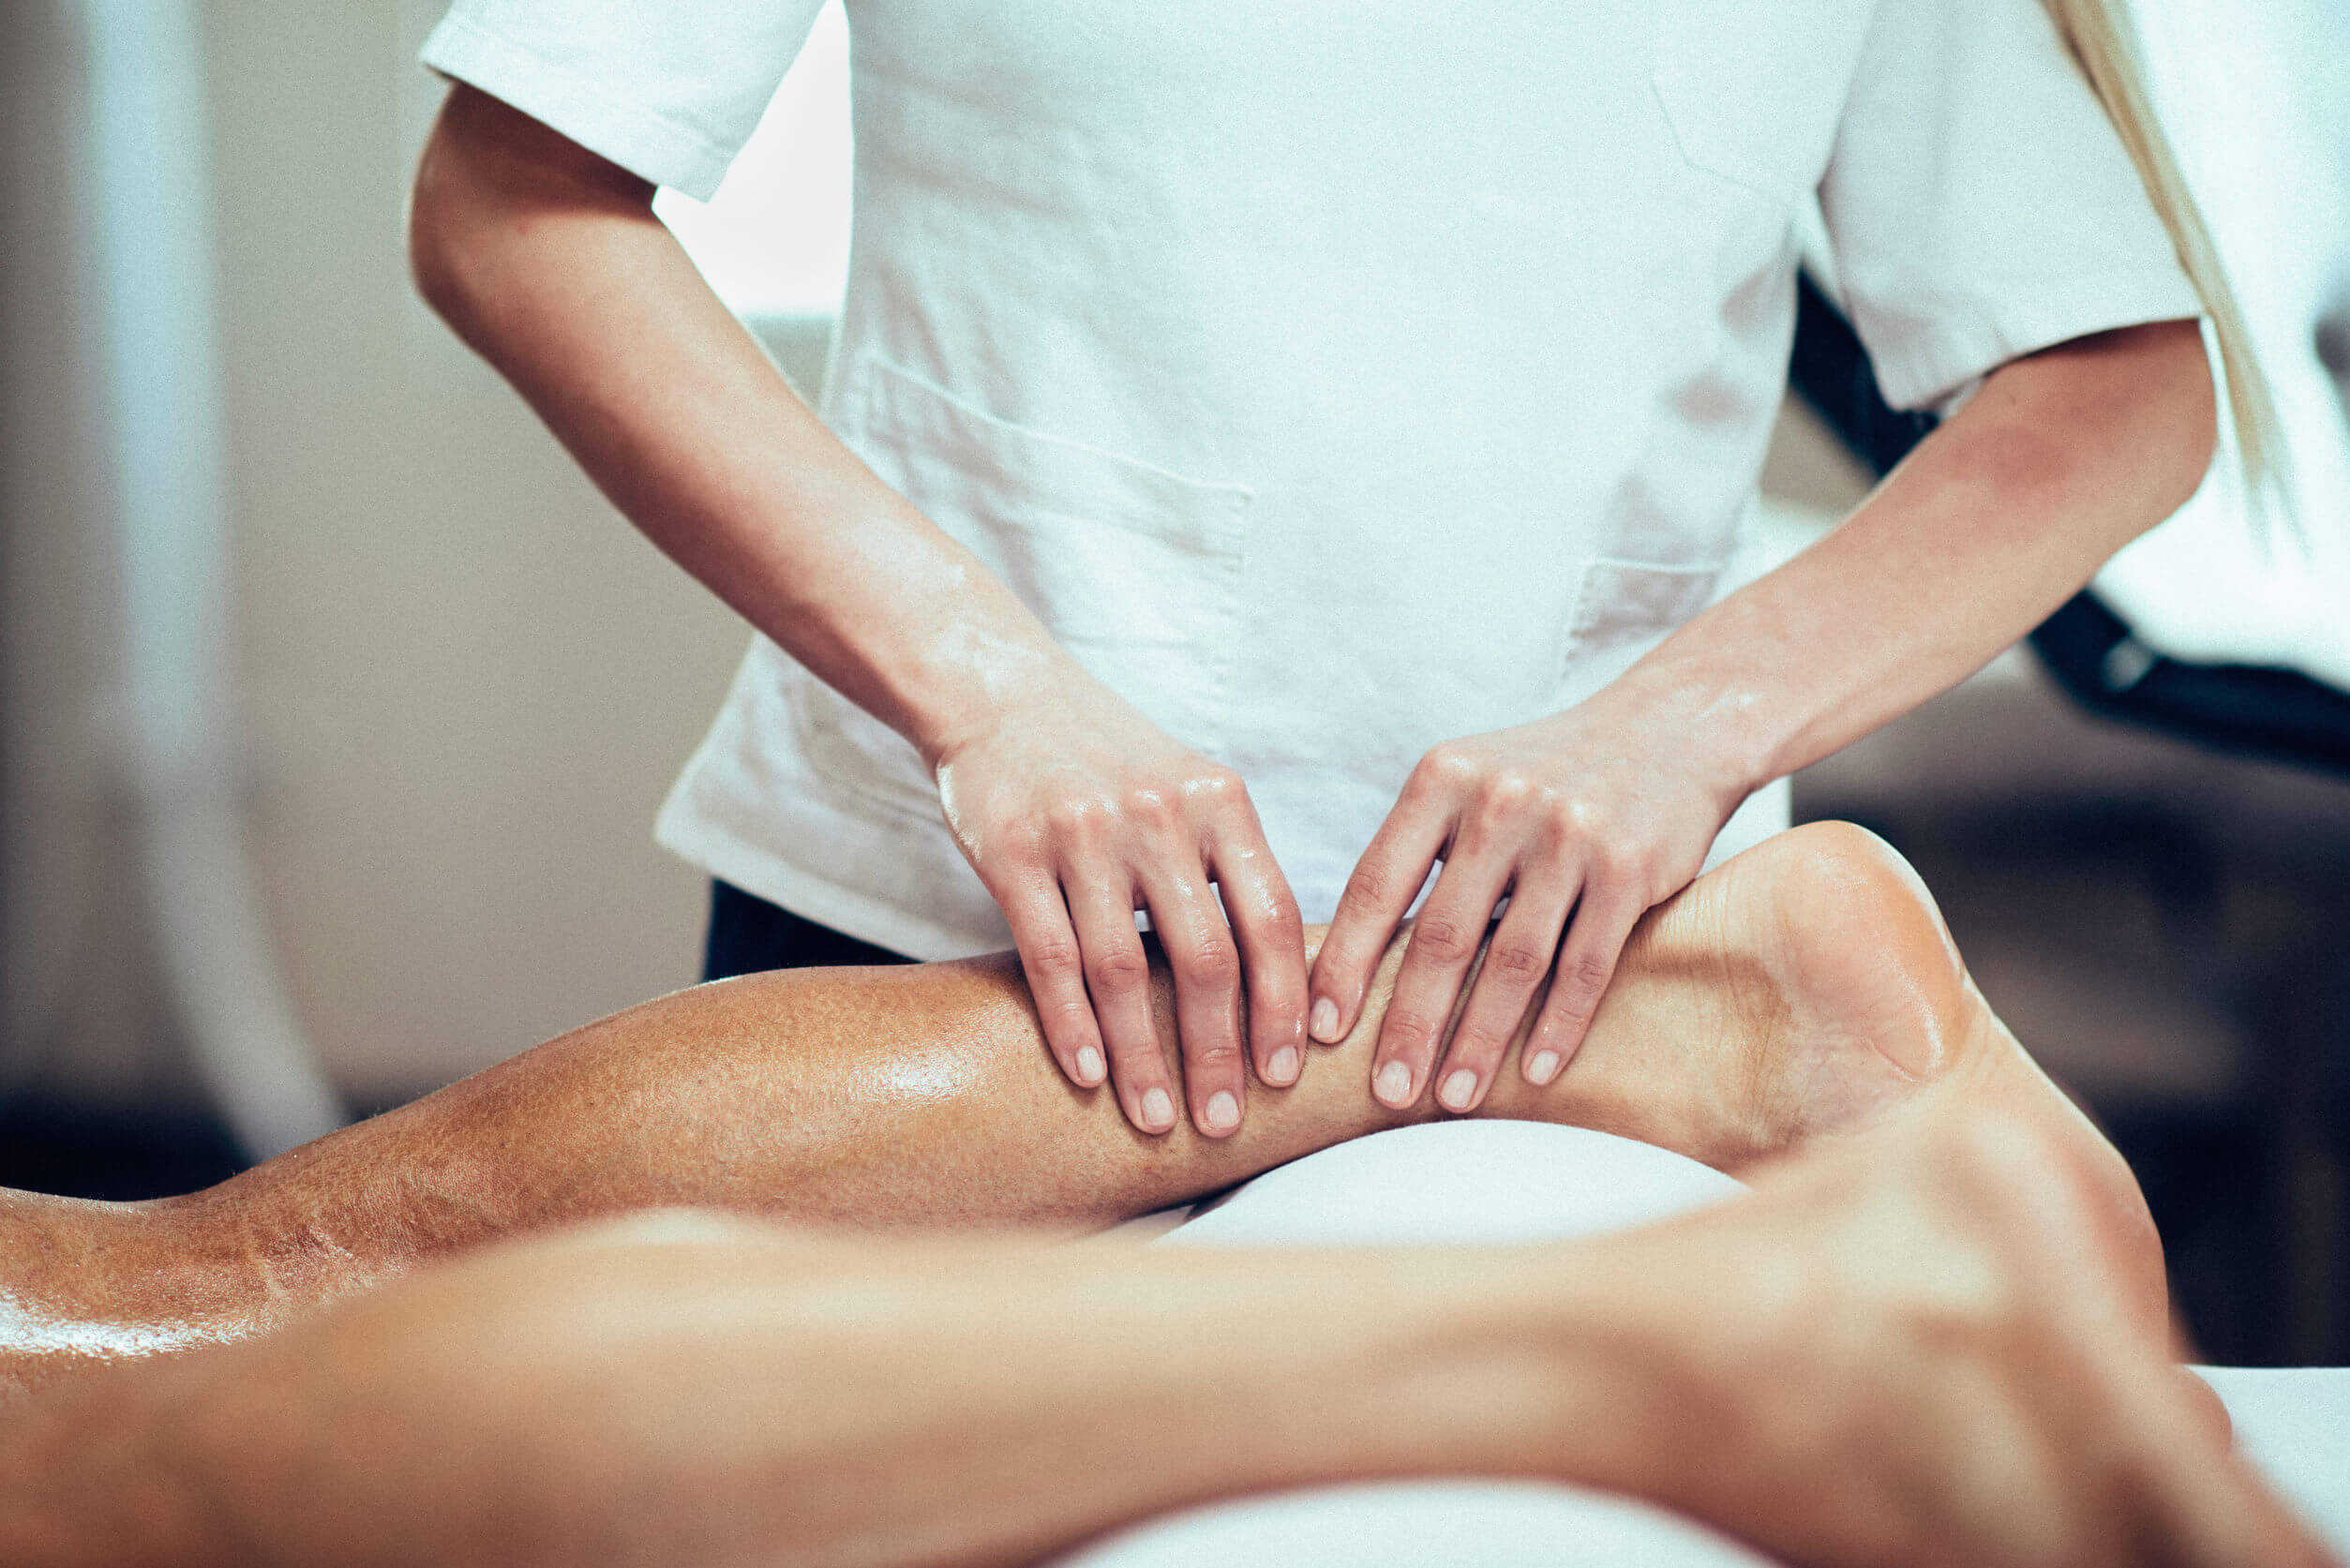 synergy physio sports massage calves